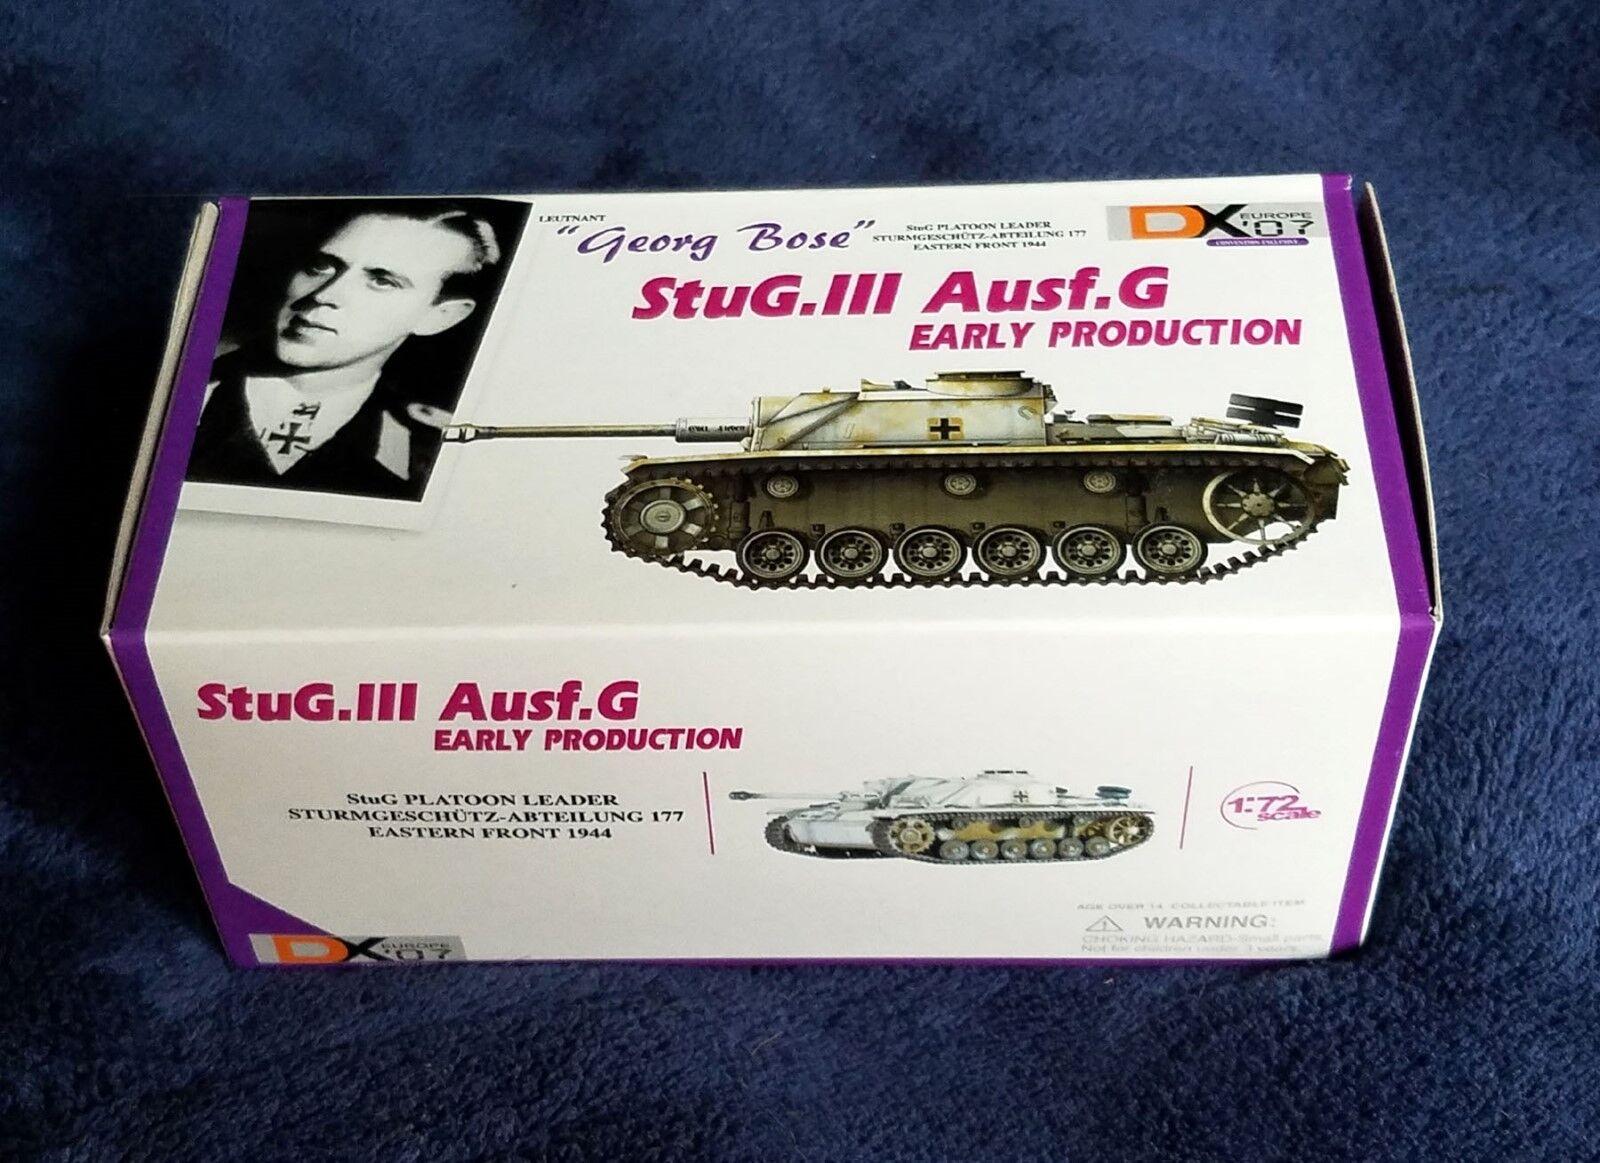 Dragon Armor 60318, 1 72 StuG. III Ausf. G, German Diecast NEW DX Europe '07